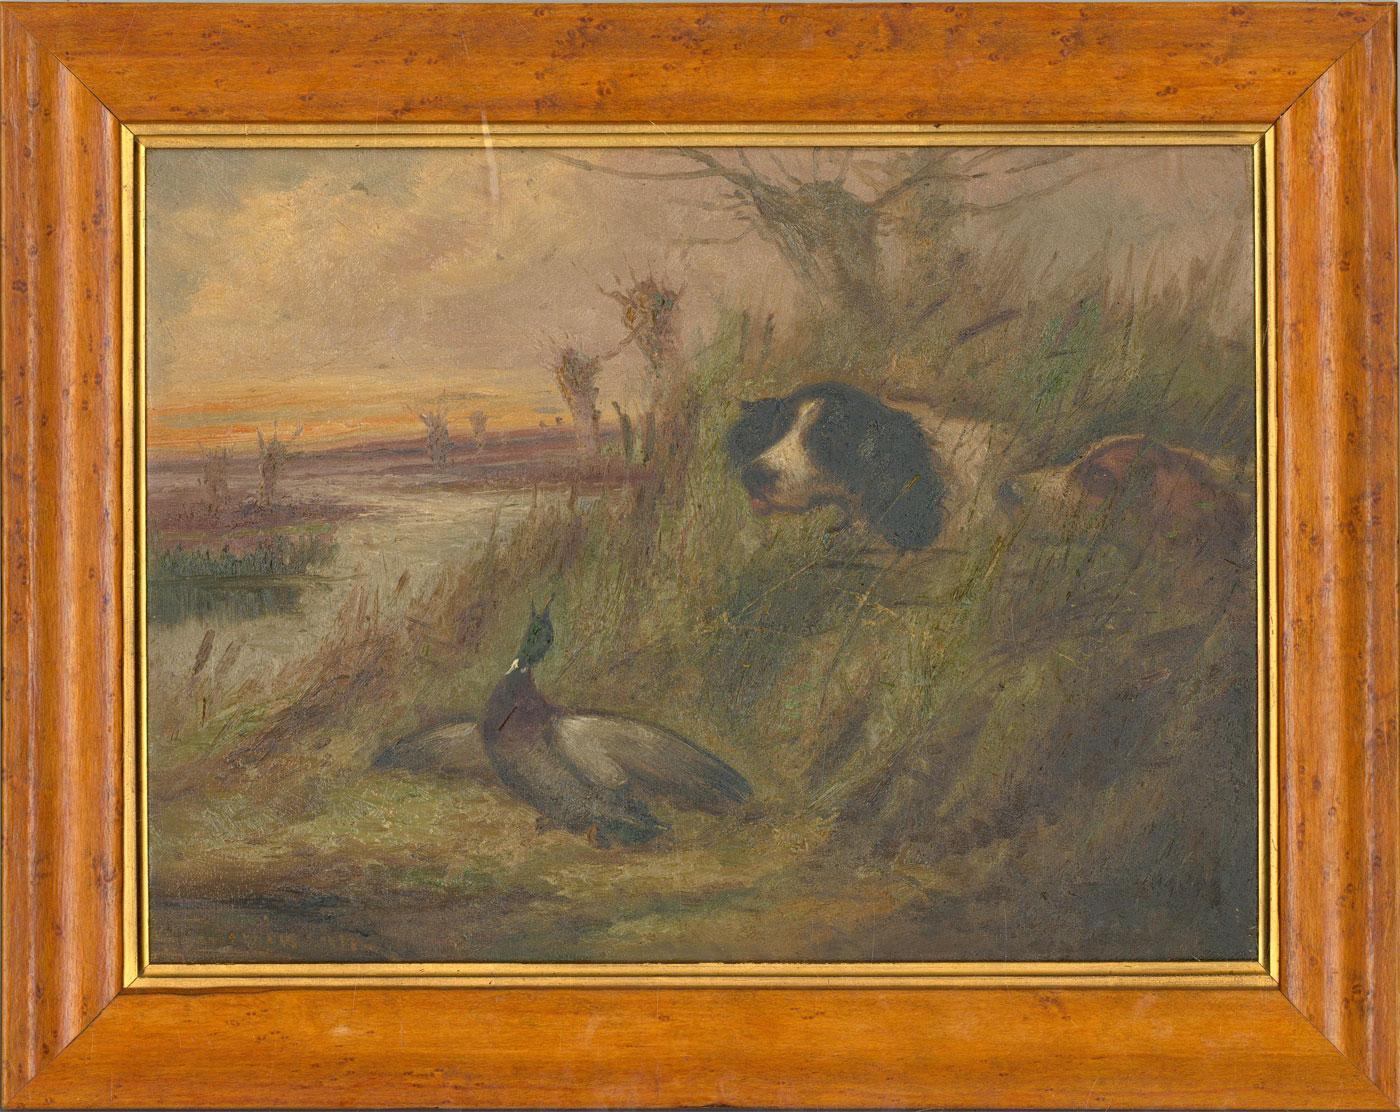 Robert Cleminson (fl.1864-1903)  - Late 19th Century Oil, Spaniels & Mallard